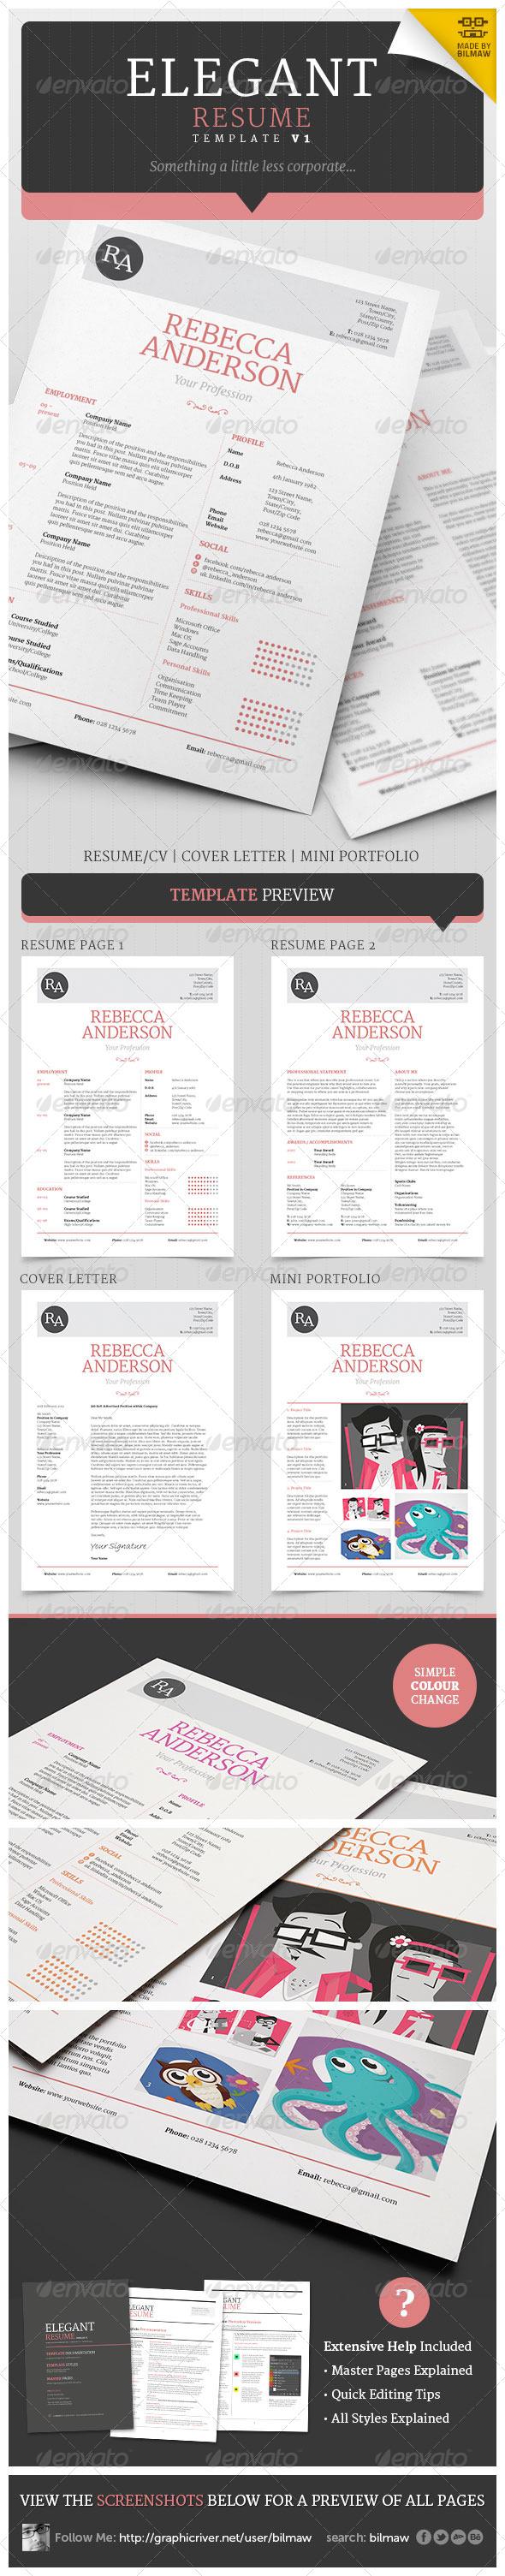 GraphicRiver Elegant Resume CV V1 5359564